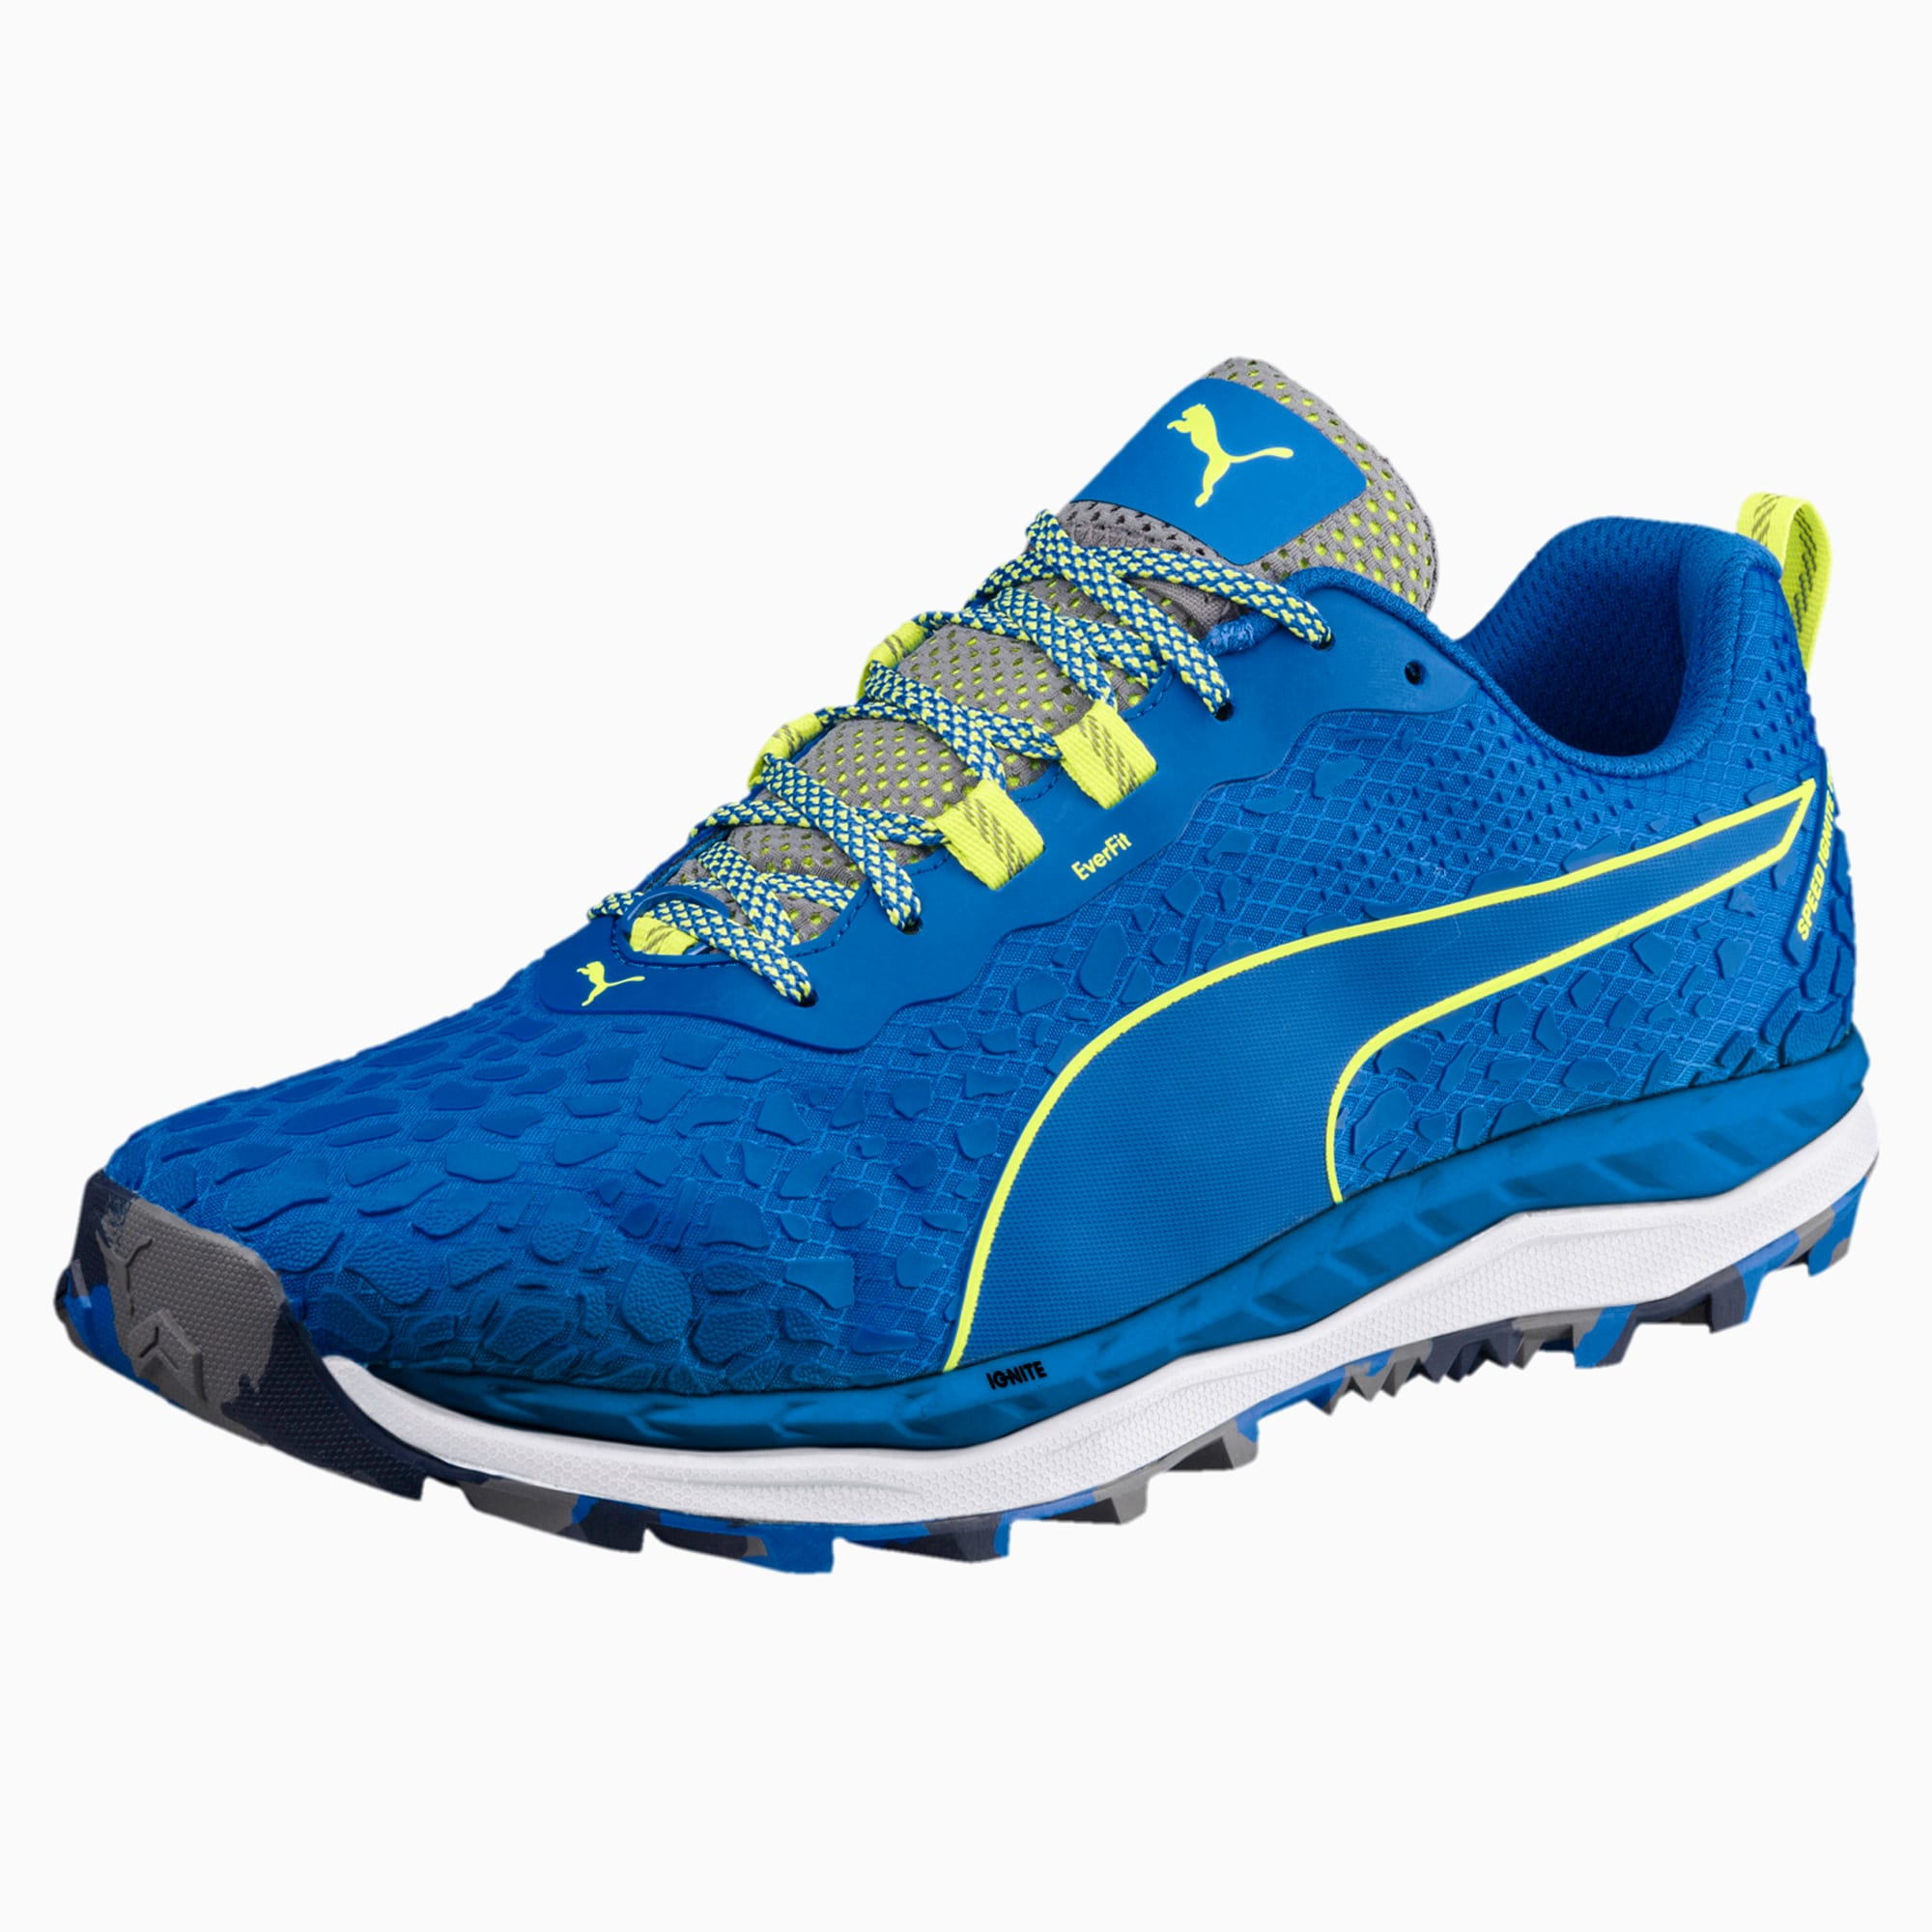 Speed IGNITE Trail 2 Men's Running Shoes   PUMA New Arrivals